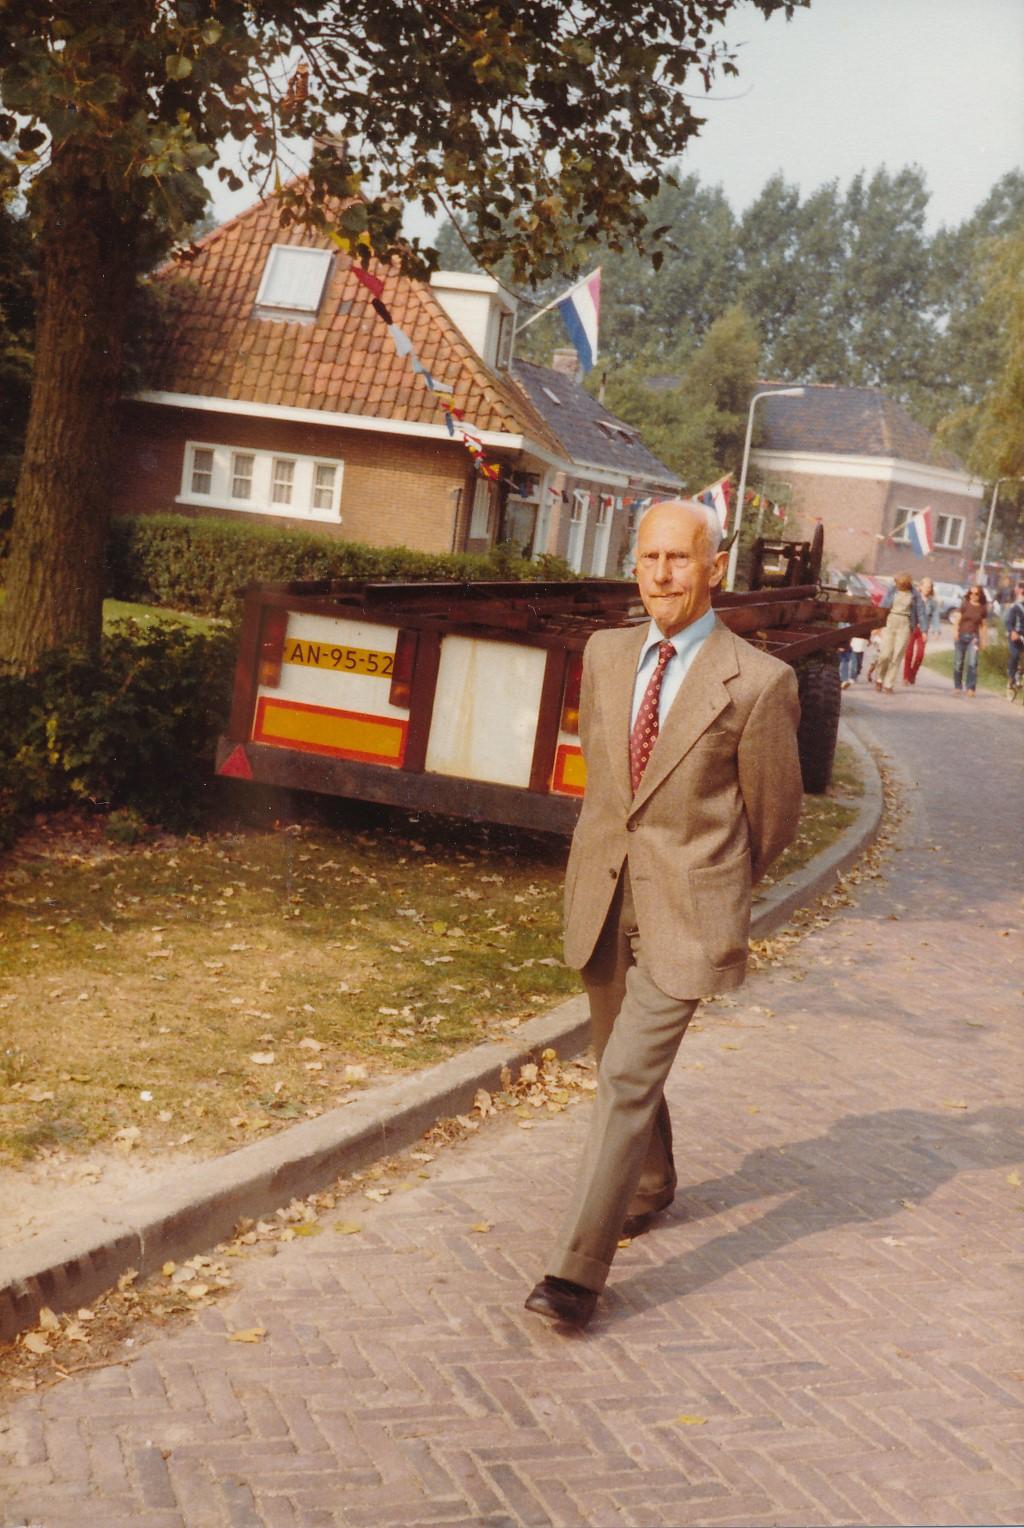 Fotoalbum Andre Kamsma, 031, Bauke Kamsma, rint op de Singel, Merke, 08-09-1981